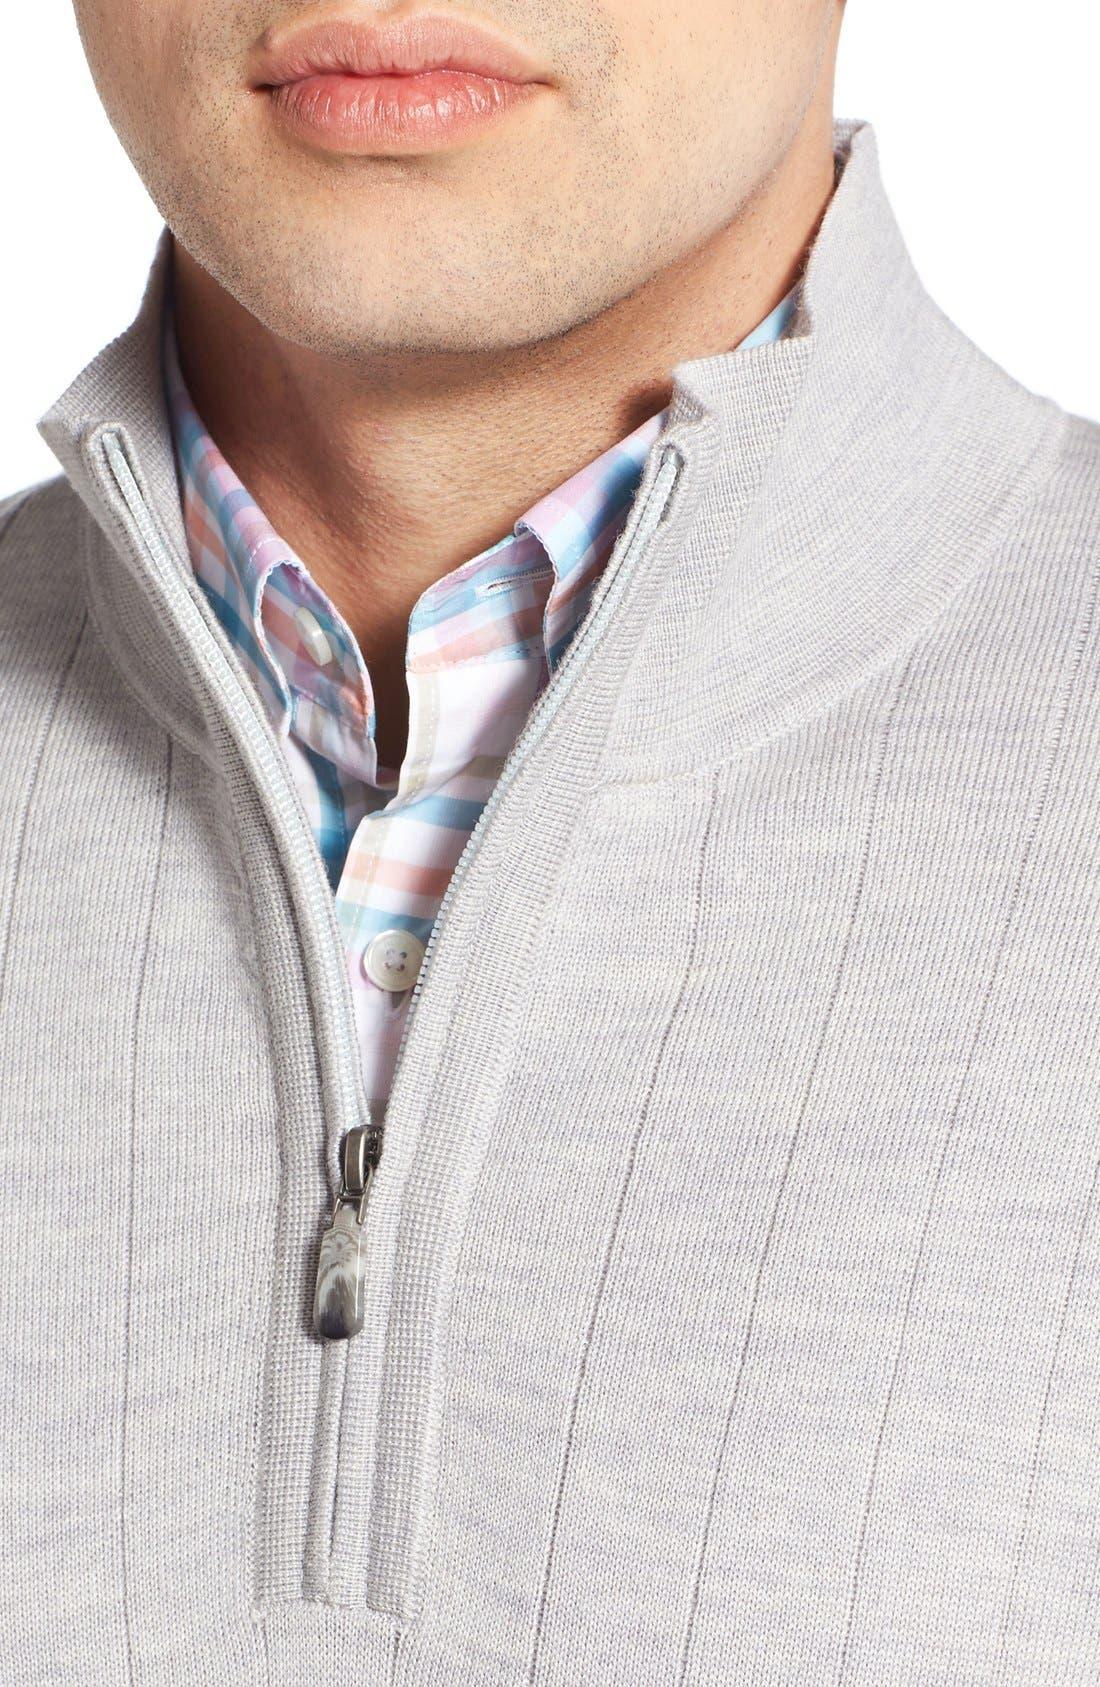 Windproof Merino Wool Quarter Zip Sweater,                             Alternate thumbnail 4, color,                             HEATHER GREY